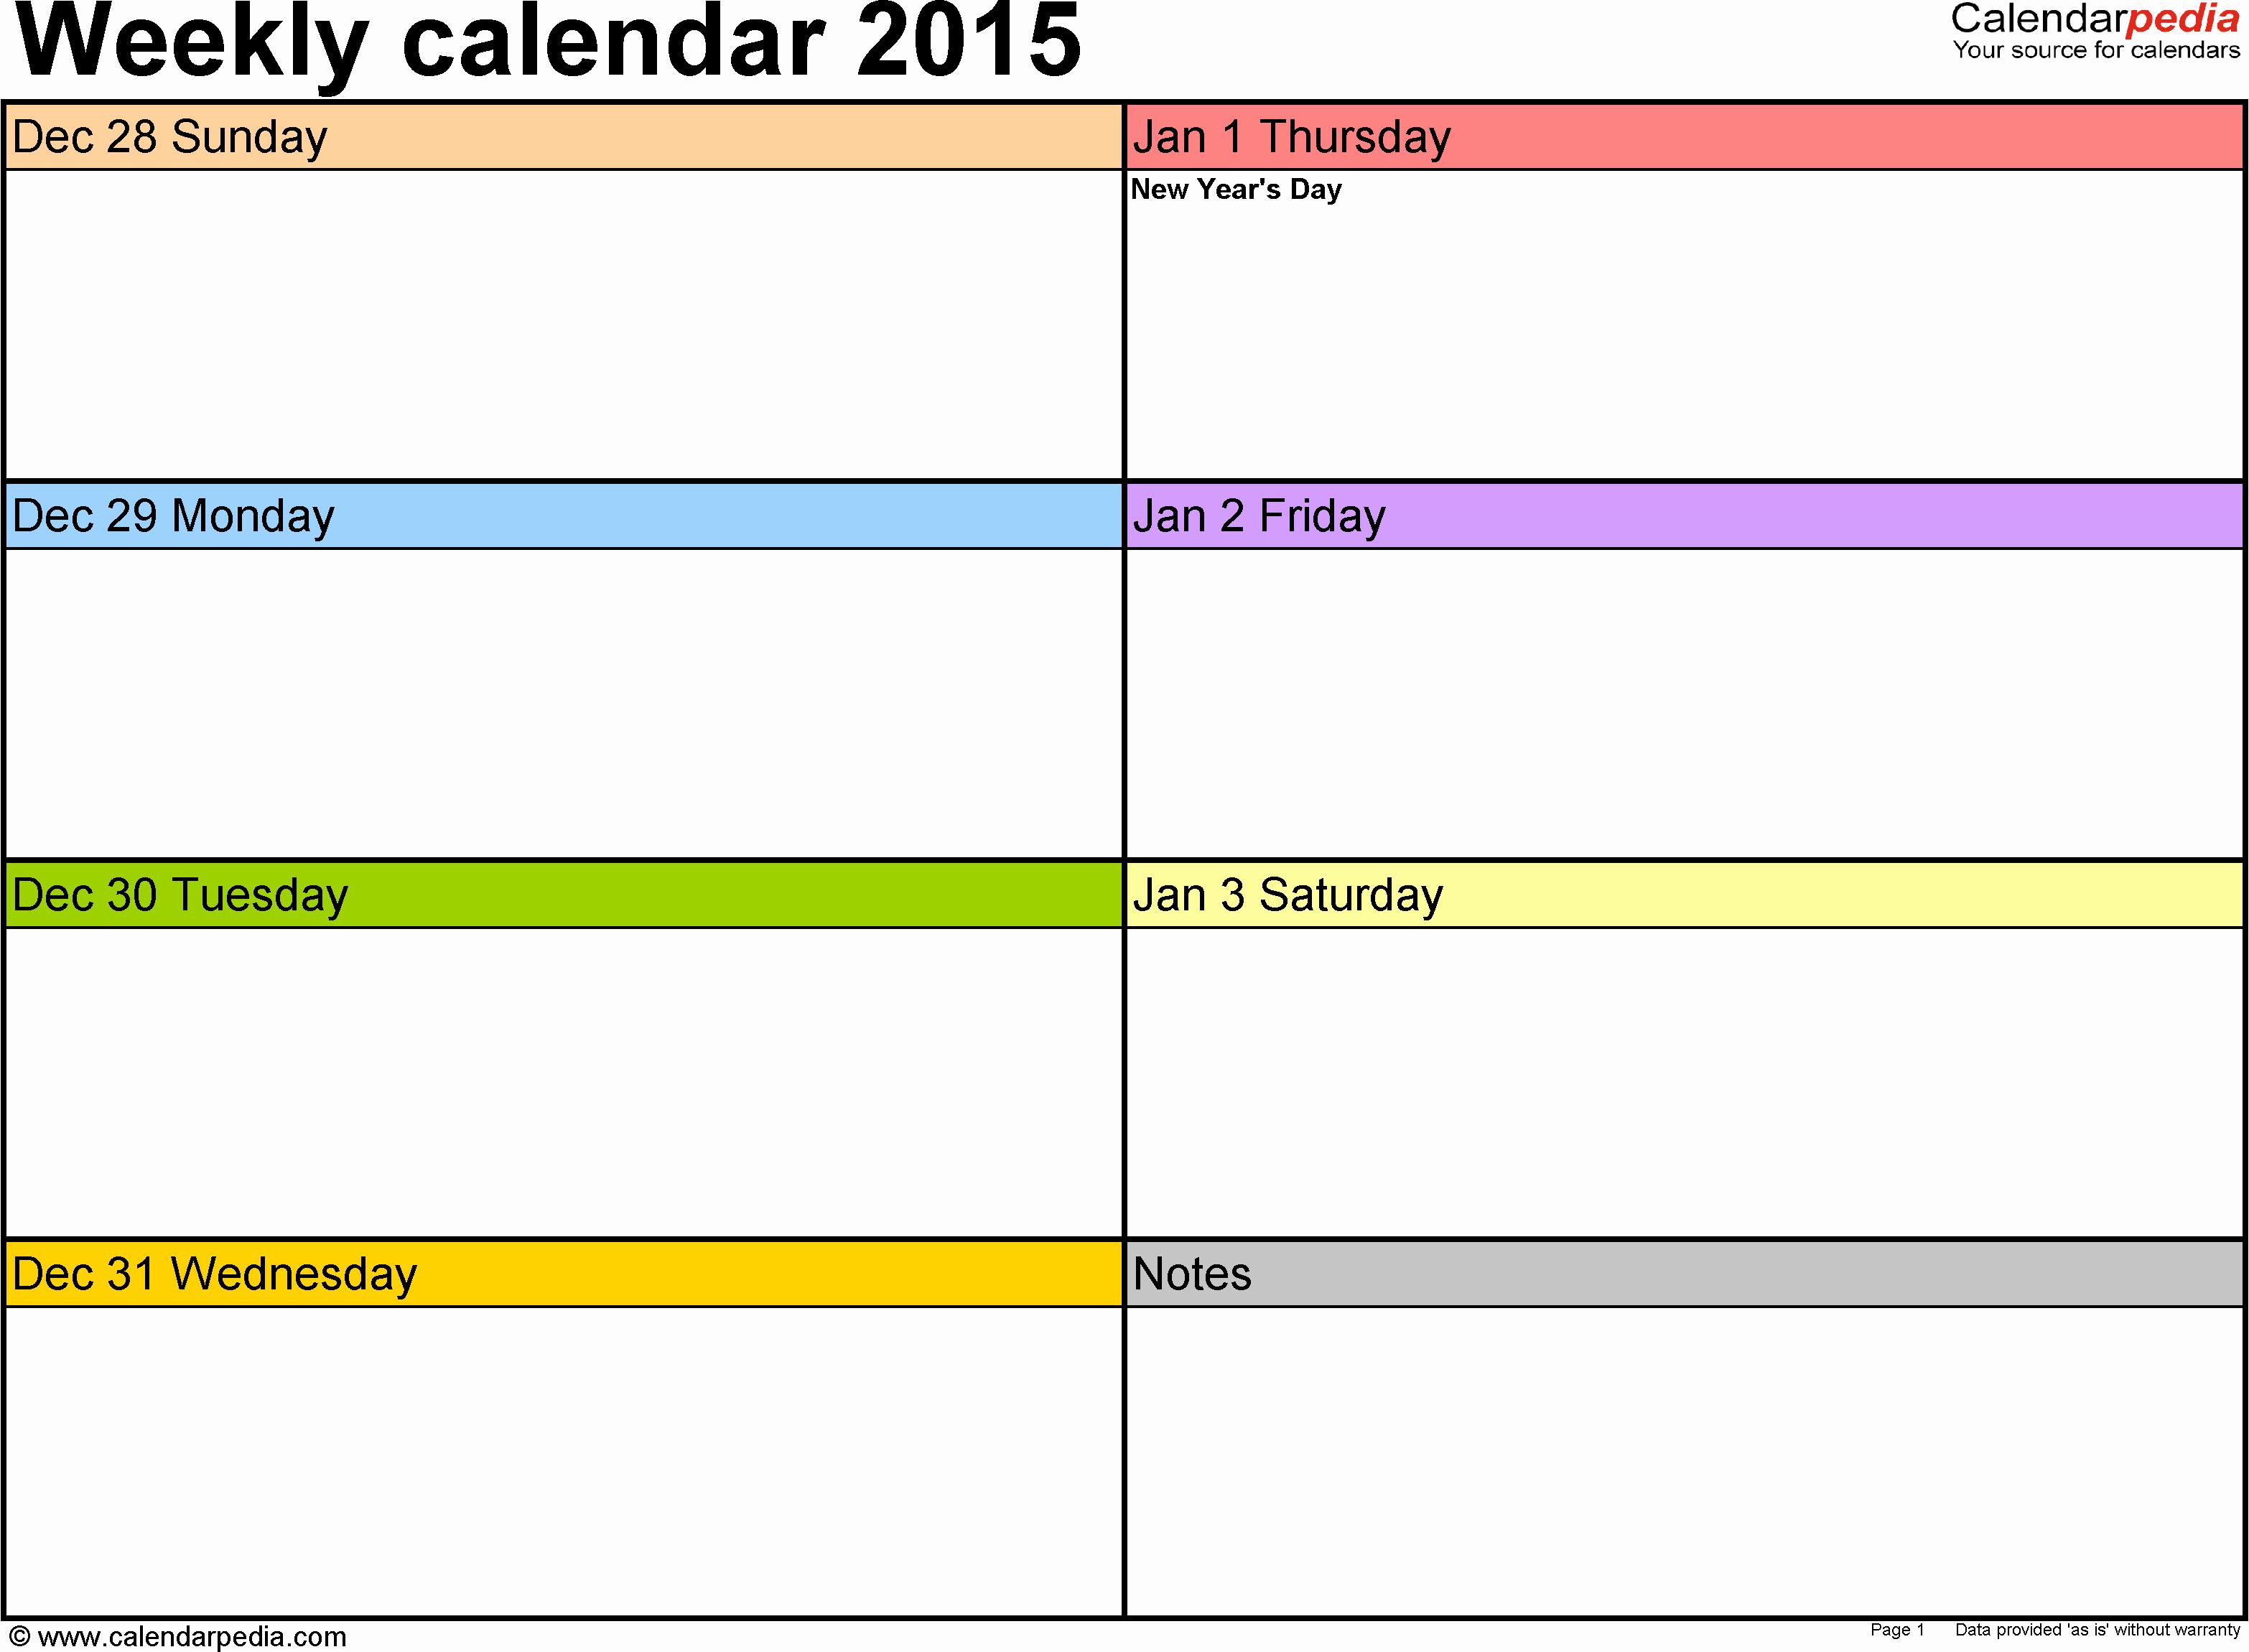 Microsoft Word Weekly Calendar Template Unique Weekly Calendar 2015 for Word 12 Free Printable Templates